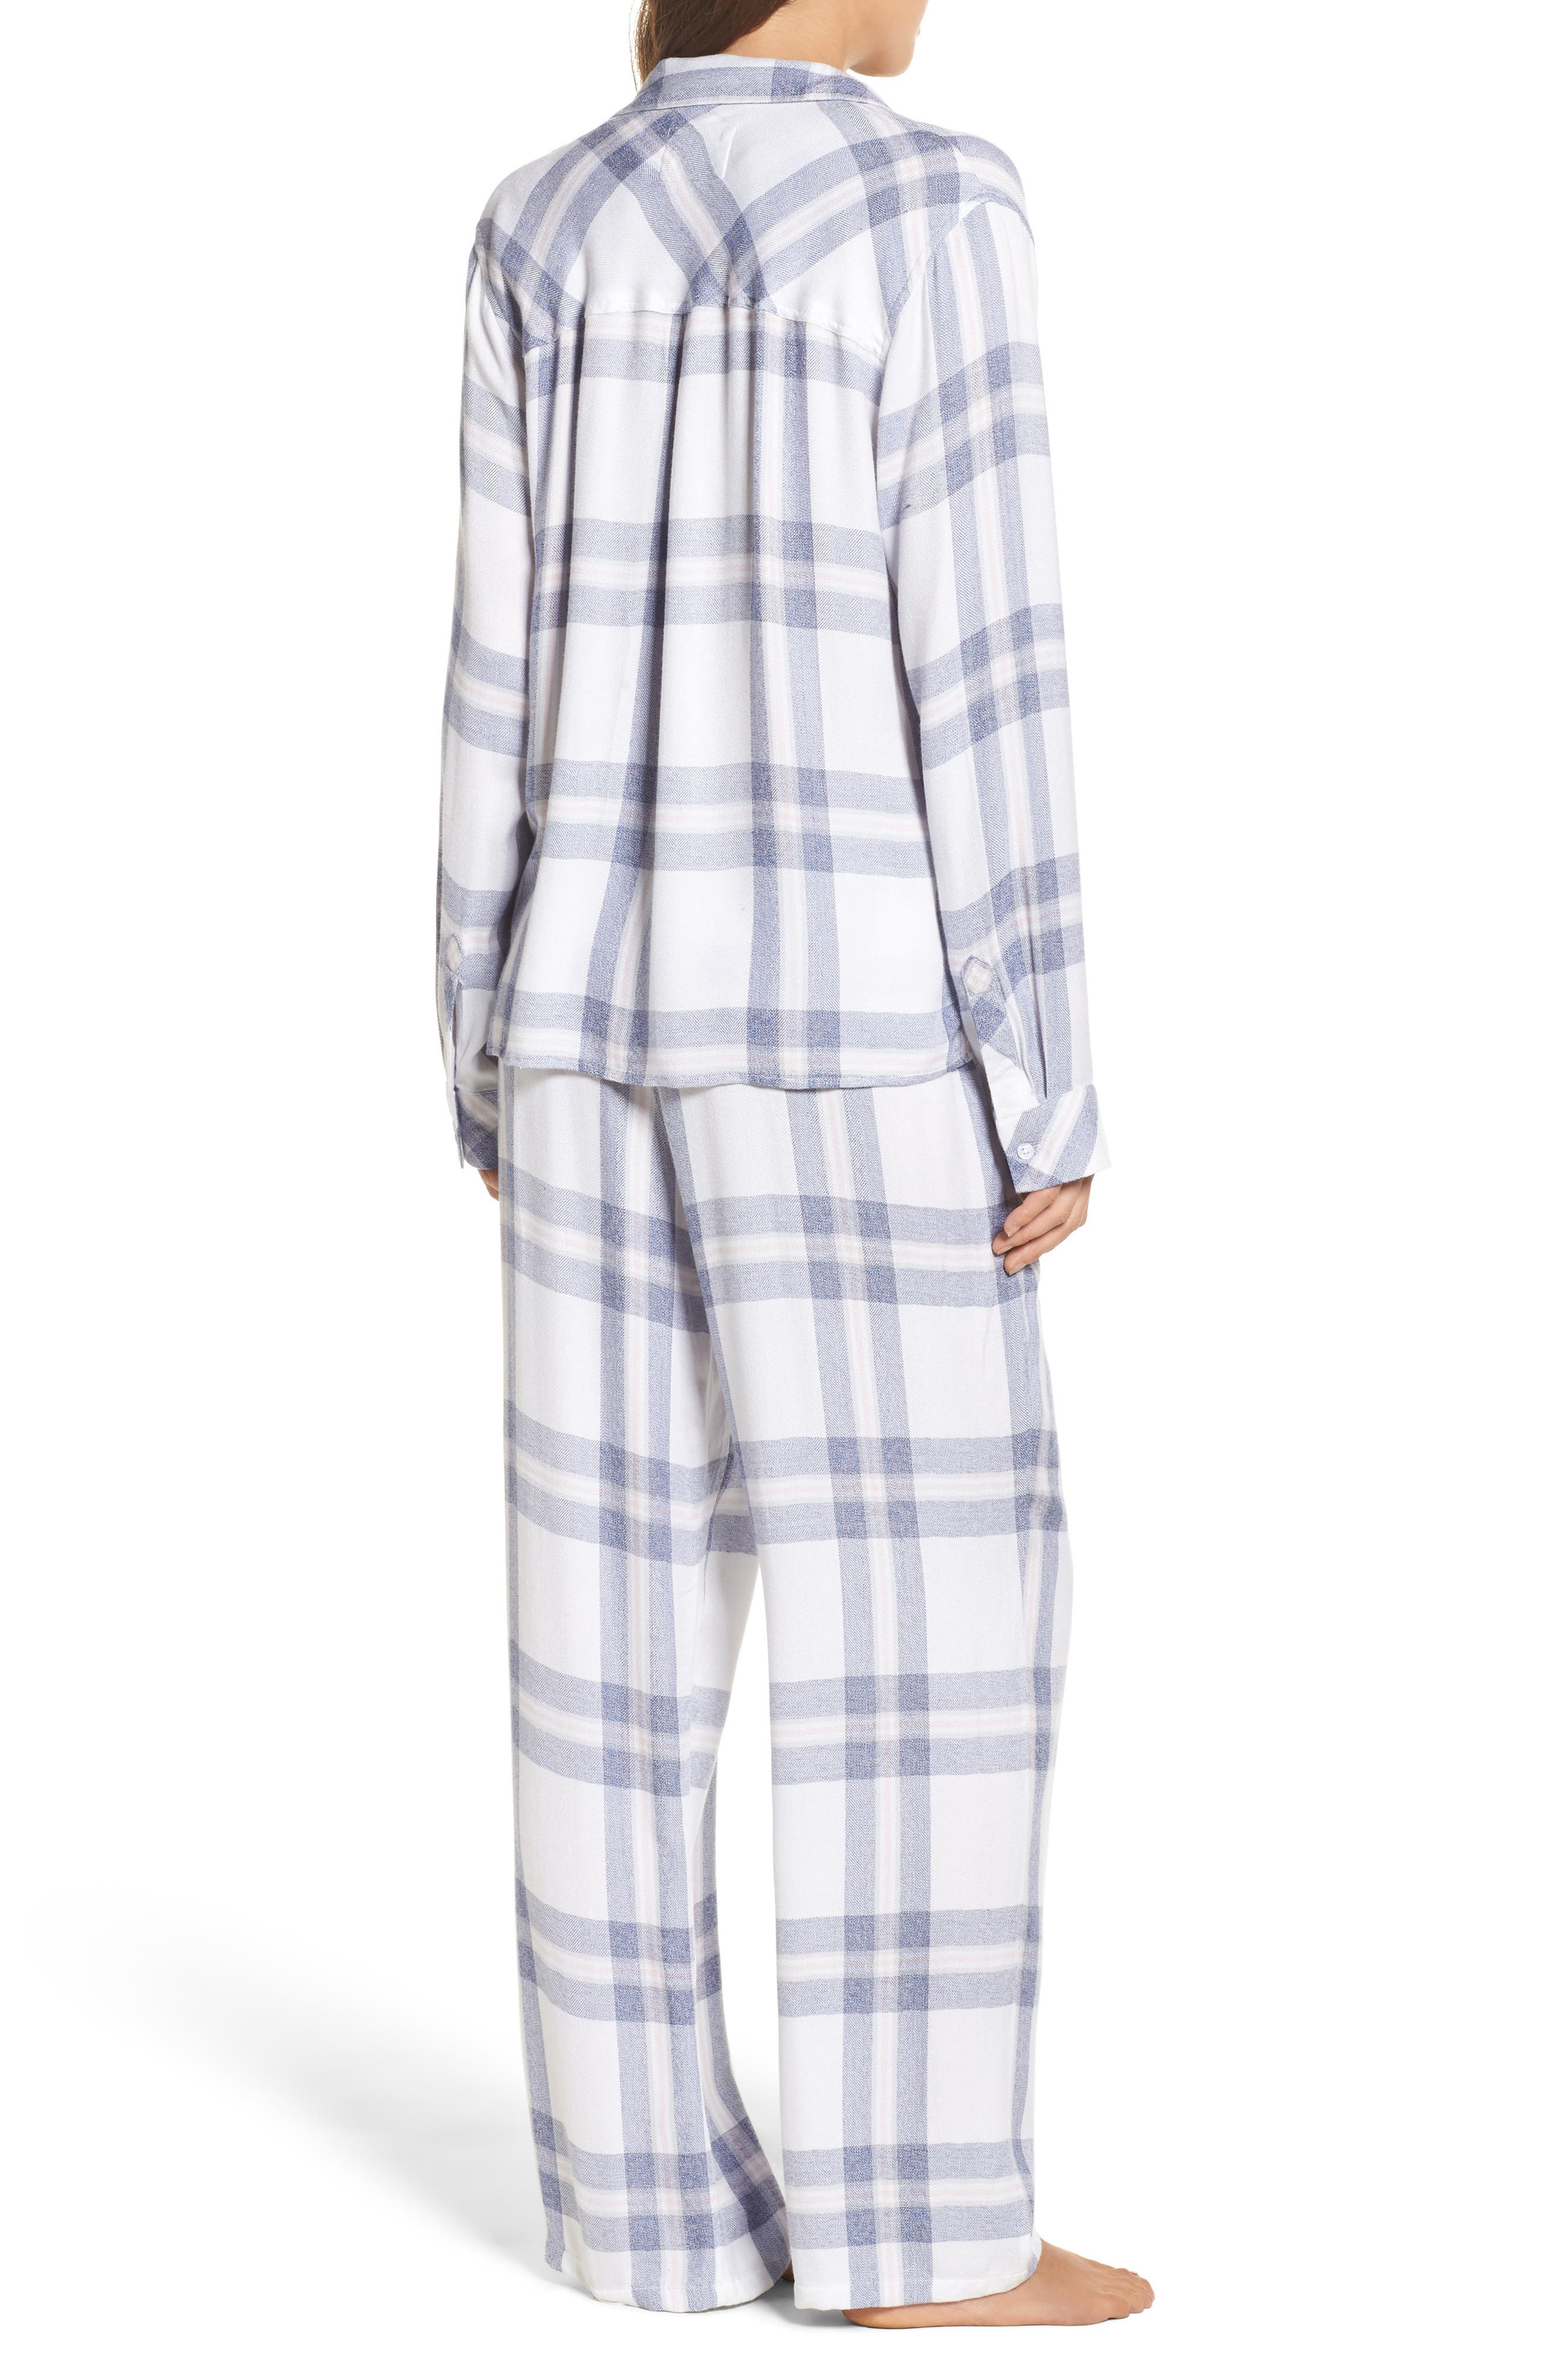 Plaid Pajamas,                             Alternate thumbnail 2, color,                             WHITE/ CHAMBRAY/ PETAL